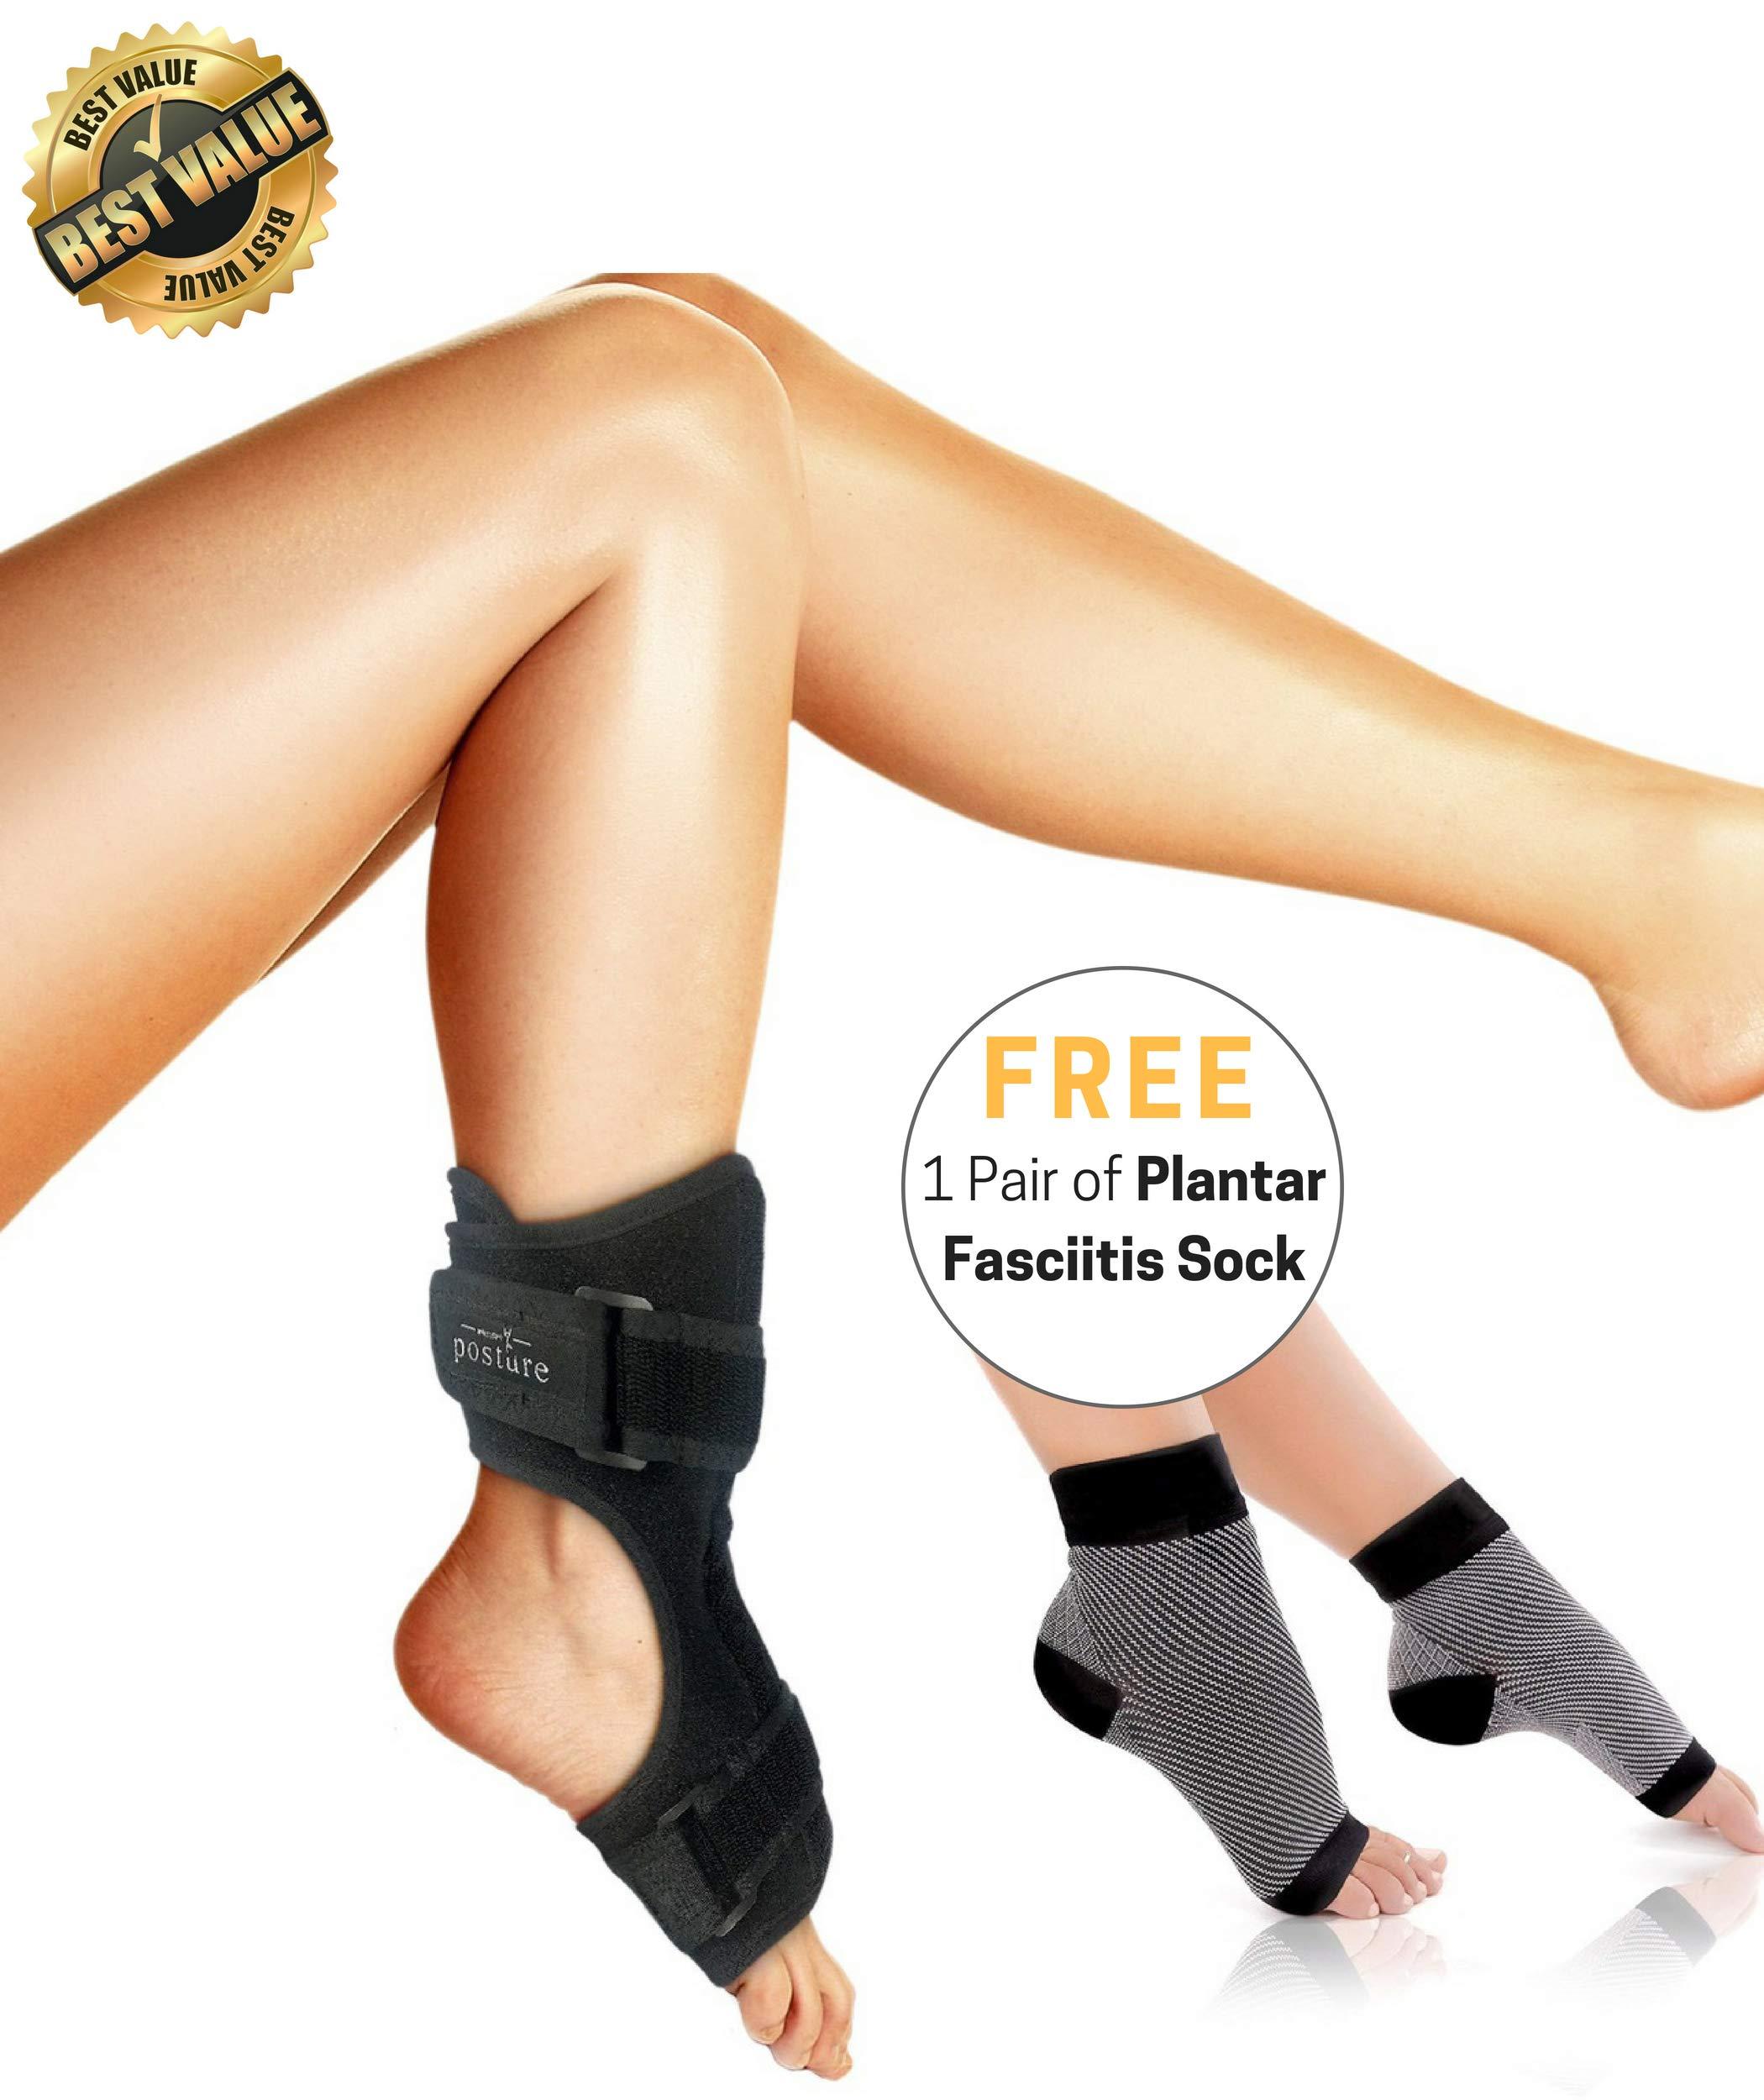 Vriksasana Plantar Fasciitis Dorsal Night Splint for Men & Women | Treatment for Heel Pain, Drop Foot and Achilles Tendonitis | Bonus Compression Socks/Foot Sleeves with Arch Support (S/M)